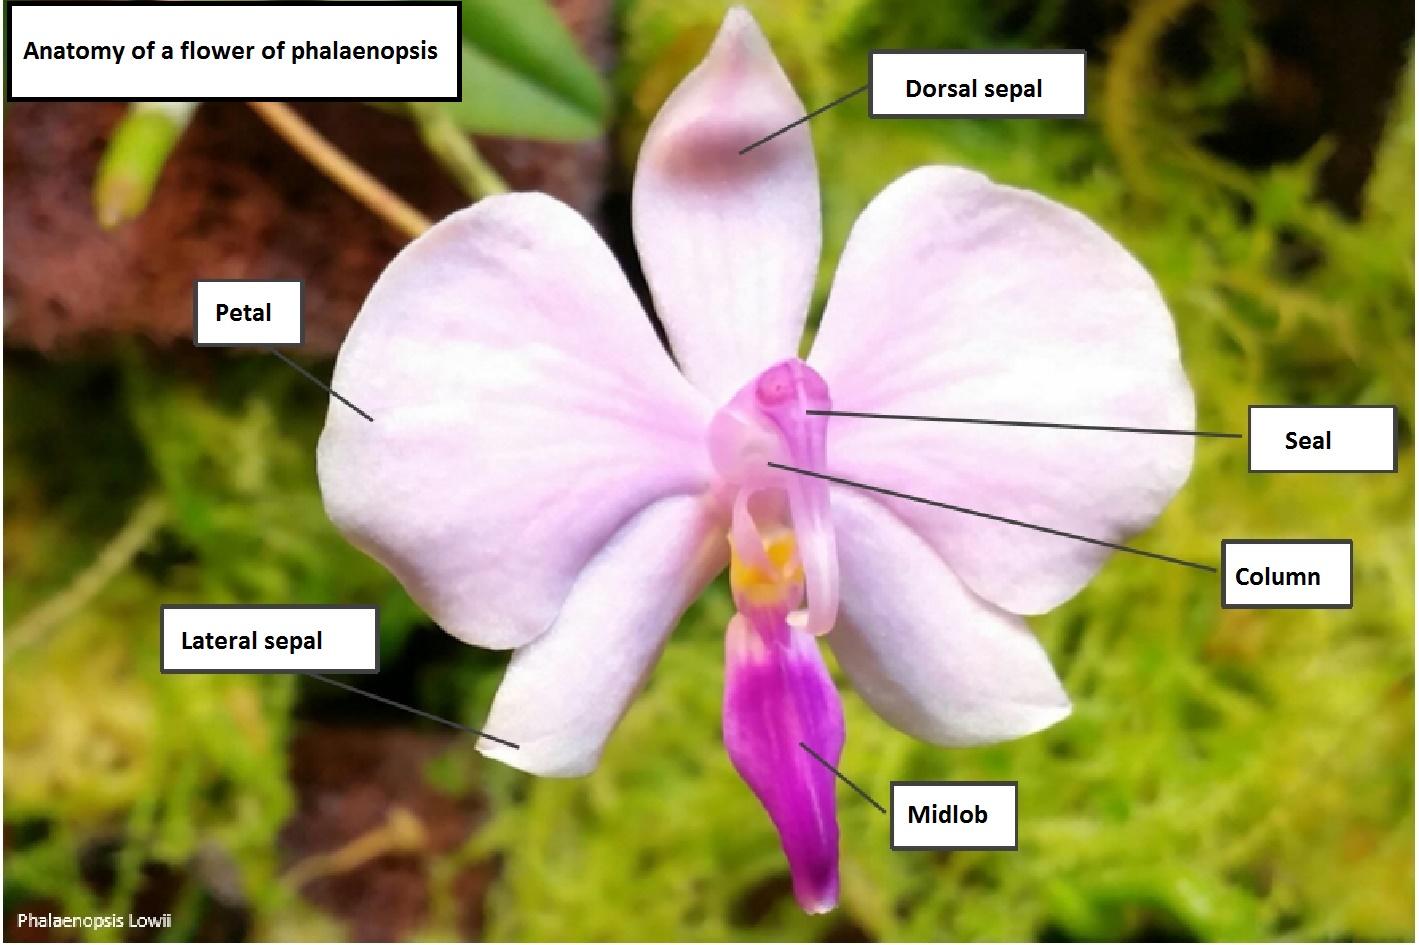 pollinisation01-eng.jpg